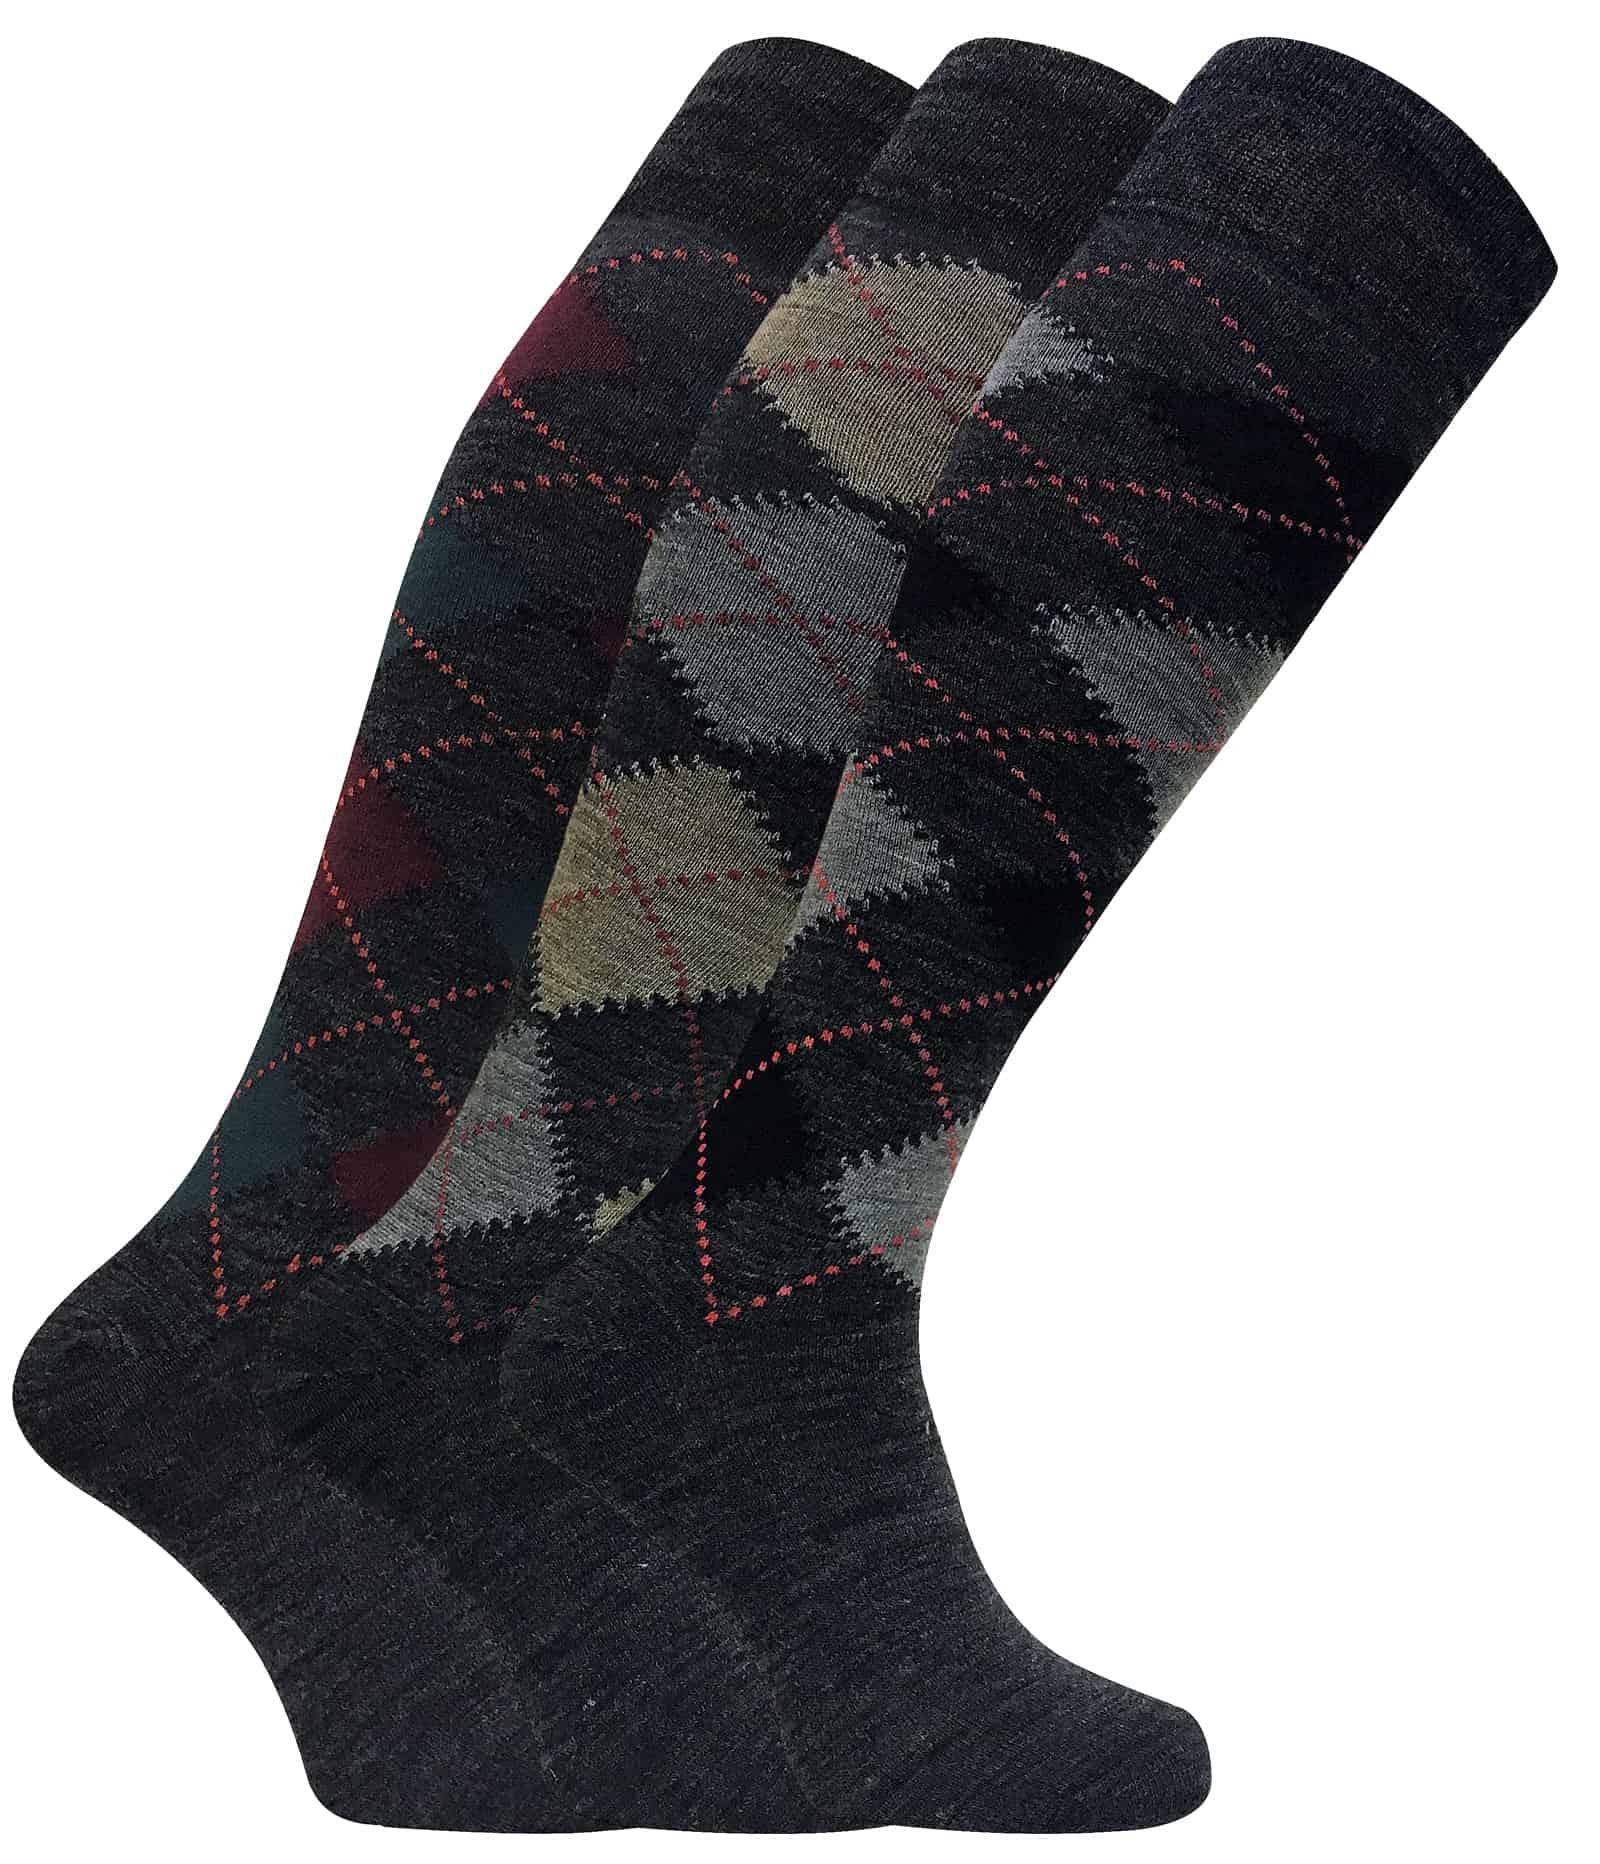 3 Pack Men's Extra Long Knee High Argyle Lambs Wool Socks - 6-11 UK, ELLW Grey